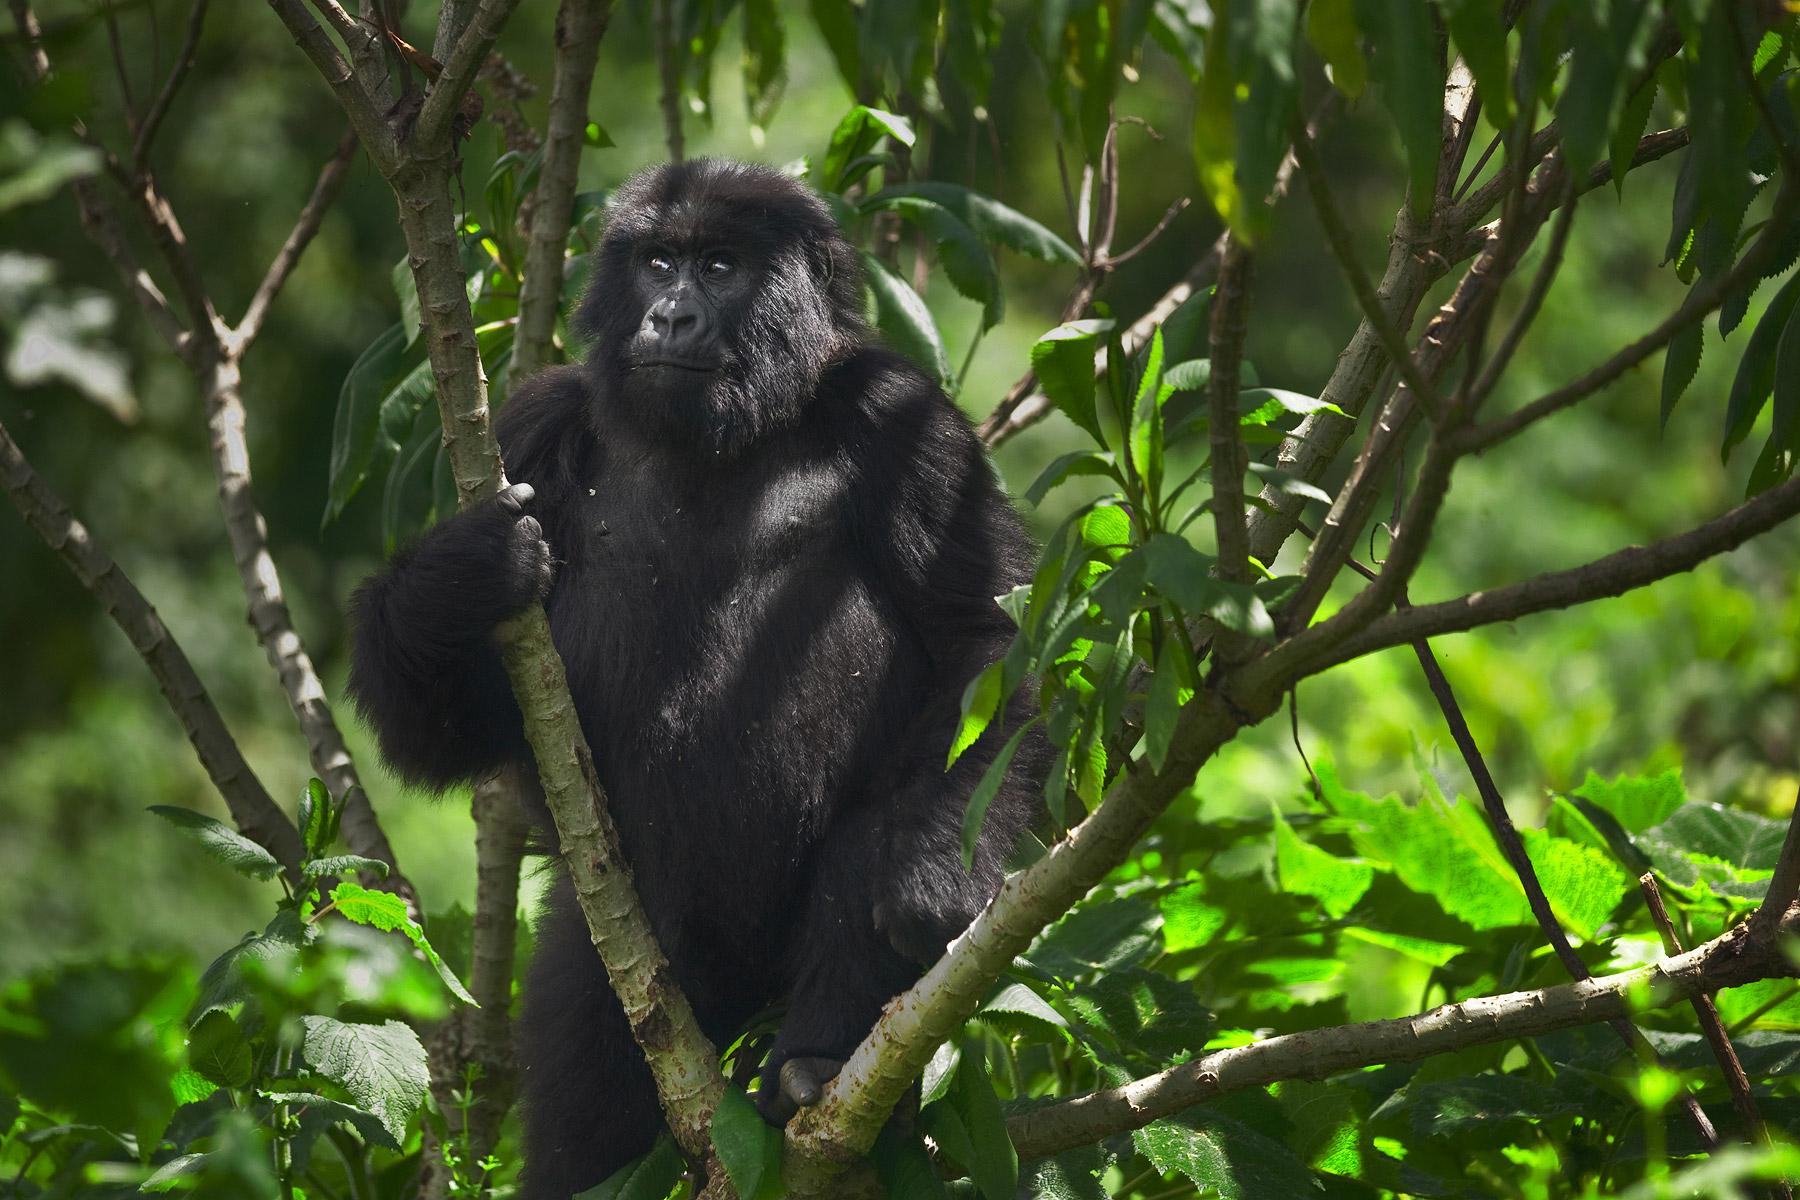 RWANDA_mountain_gorilla_in_tree_